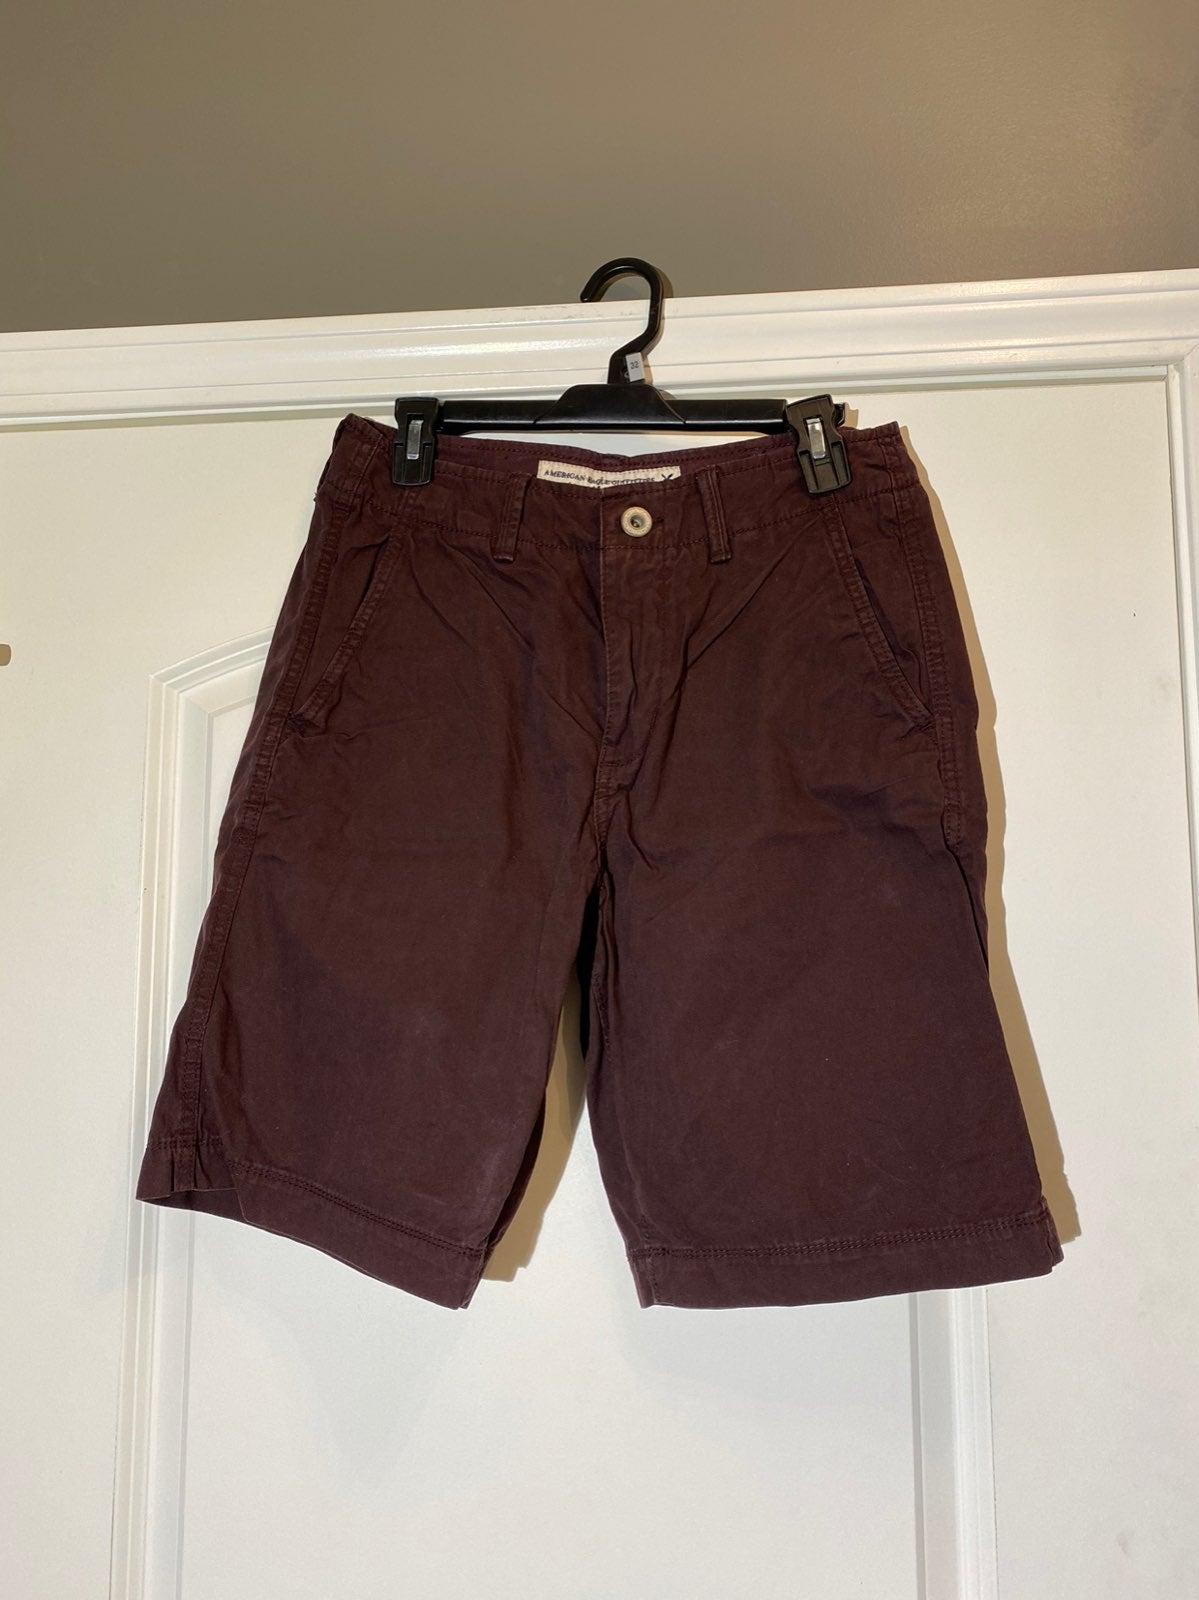 American Eagle classic fit shorts